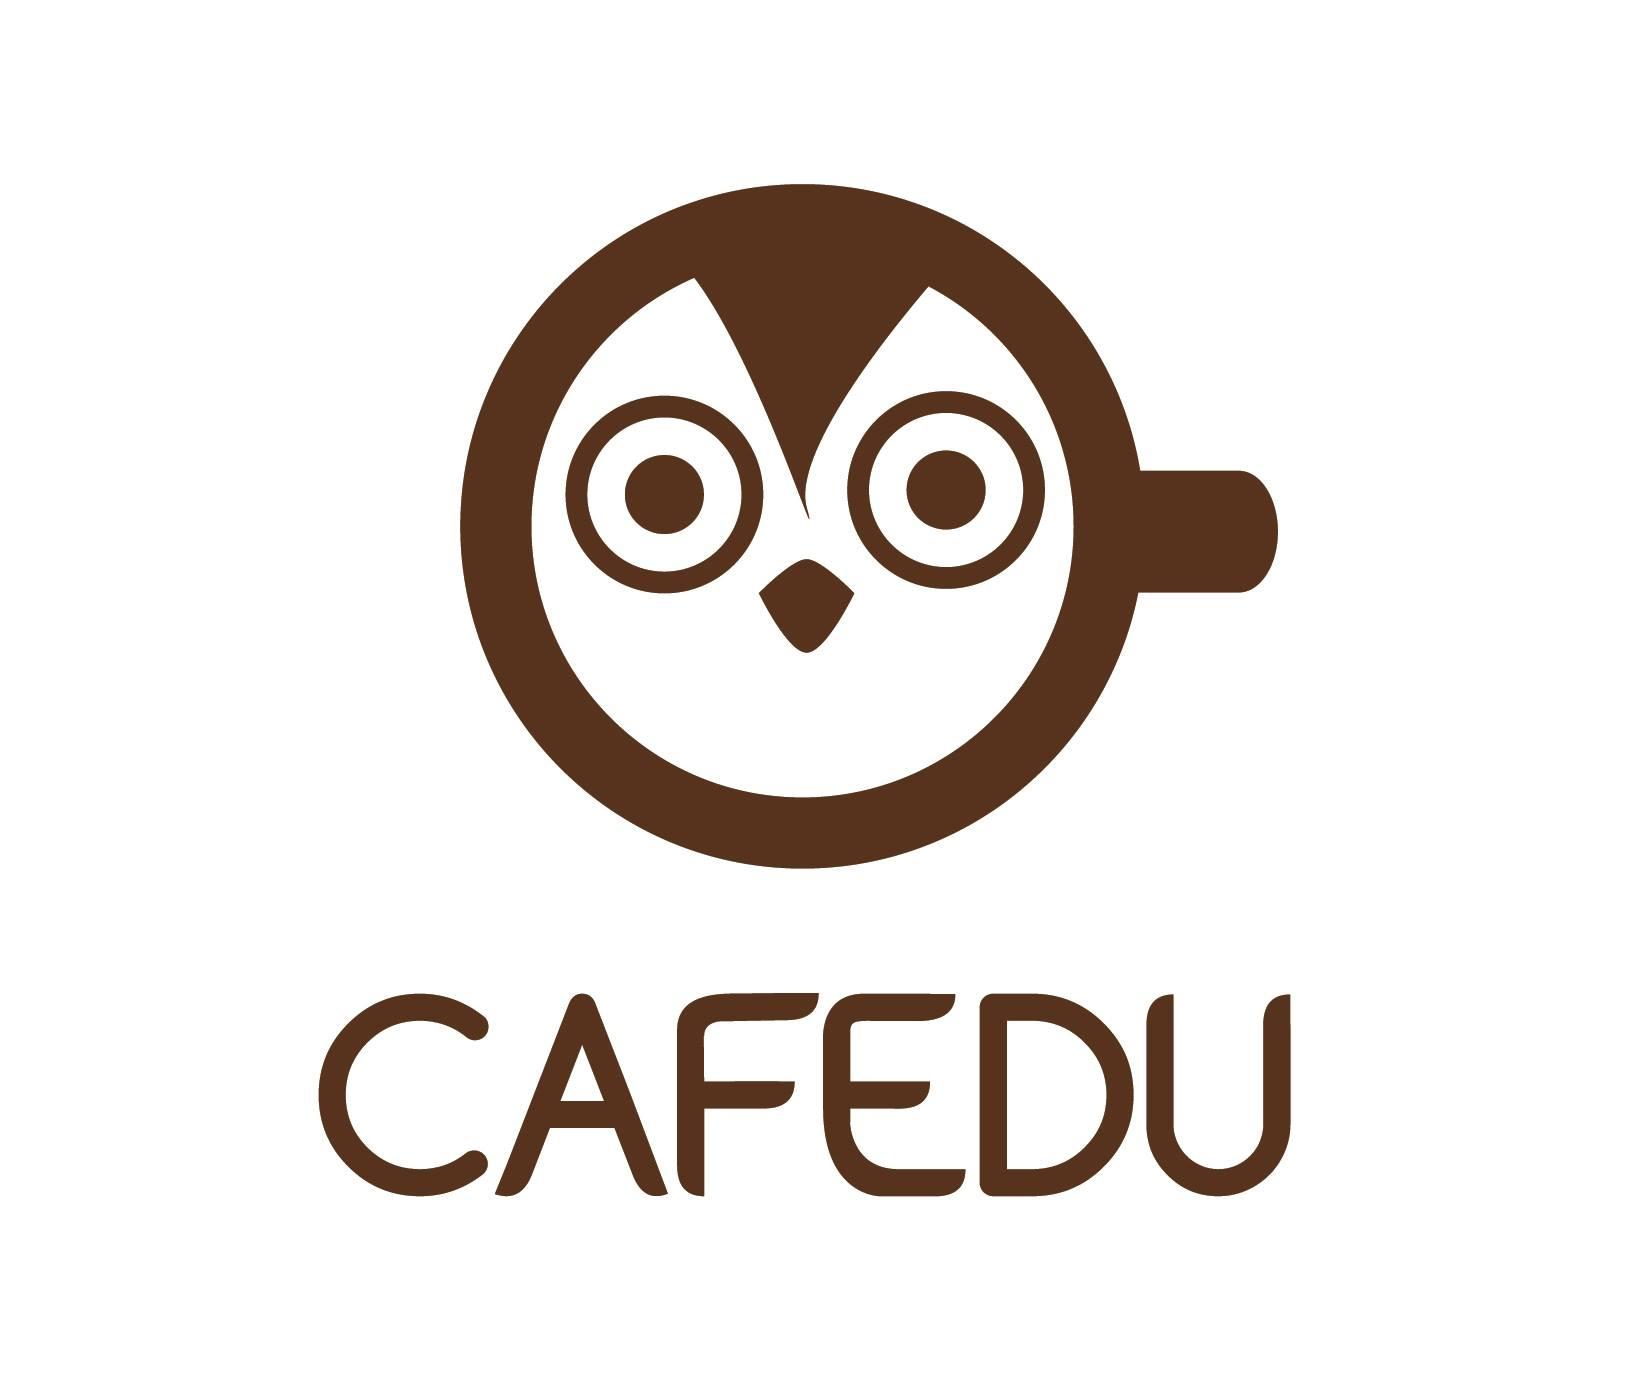 cafedu